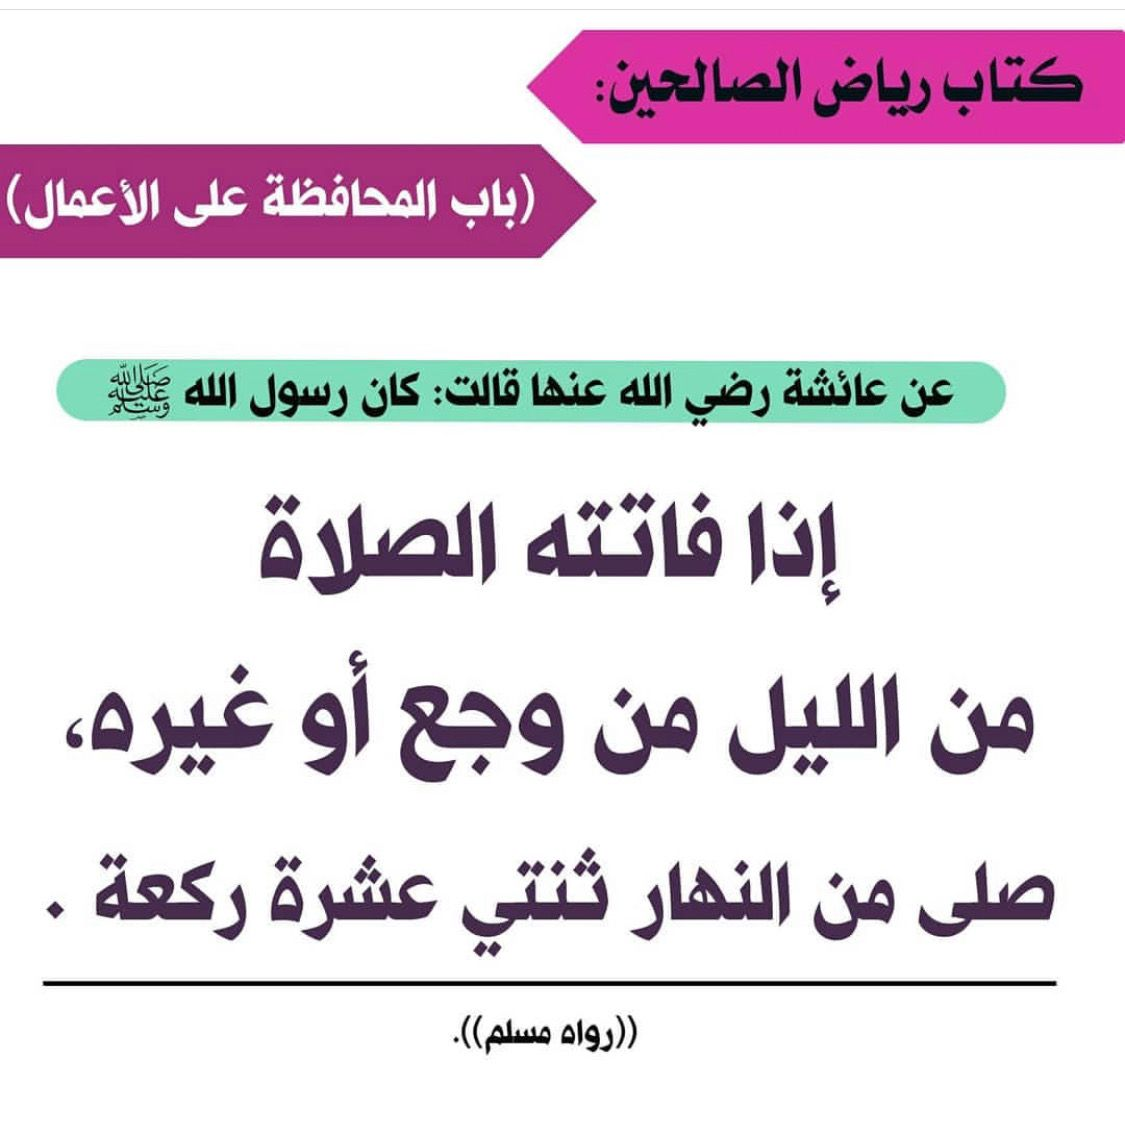 Pin By Mahassen Chahine On أقوال الصحابة والعلماء Ios Messenger Ios Ili